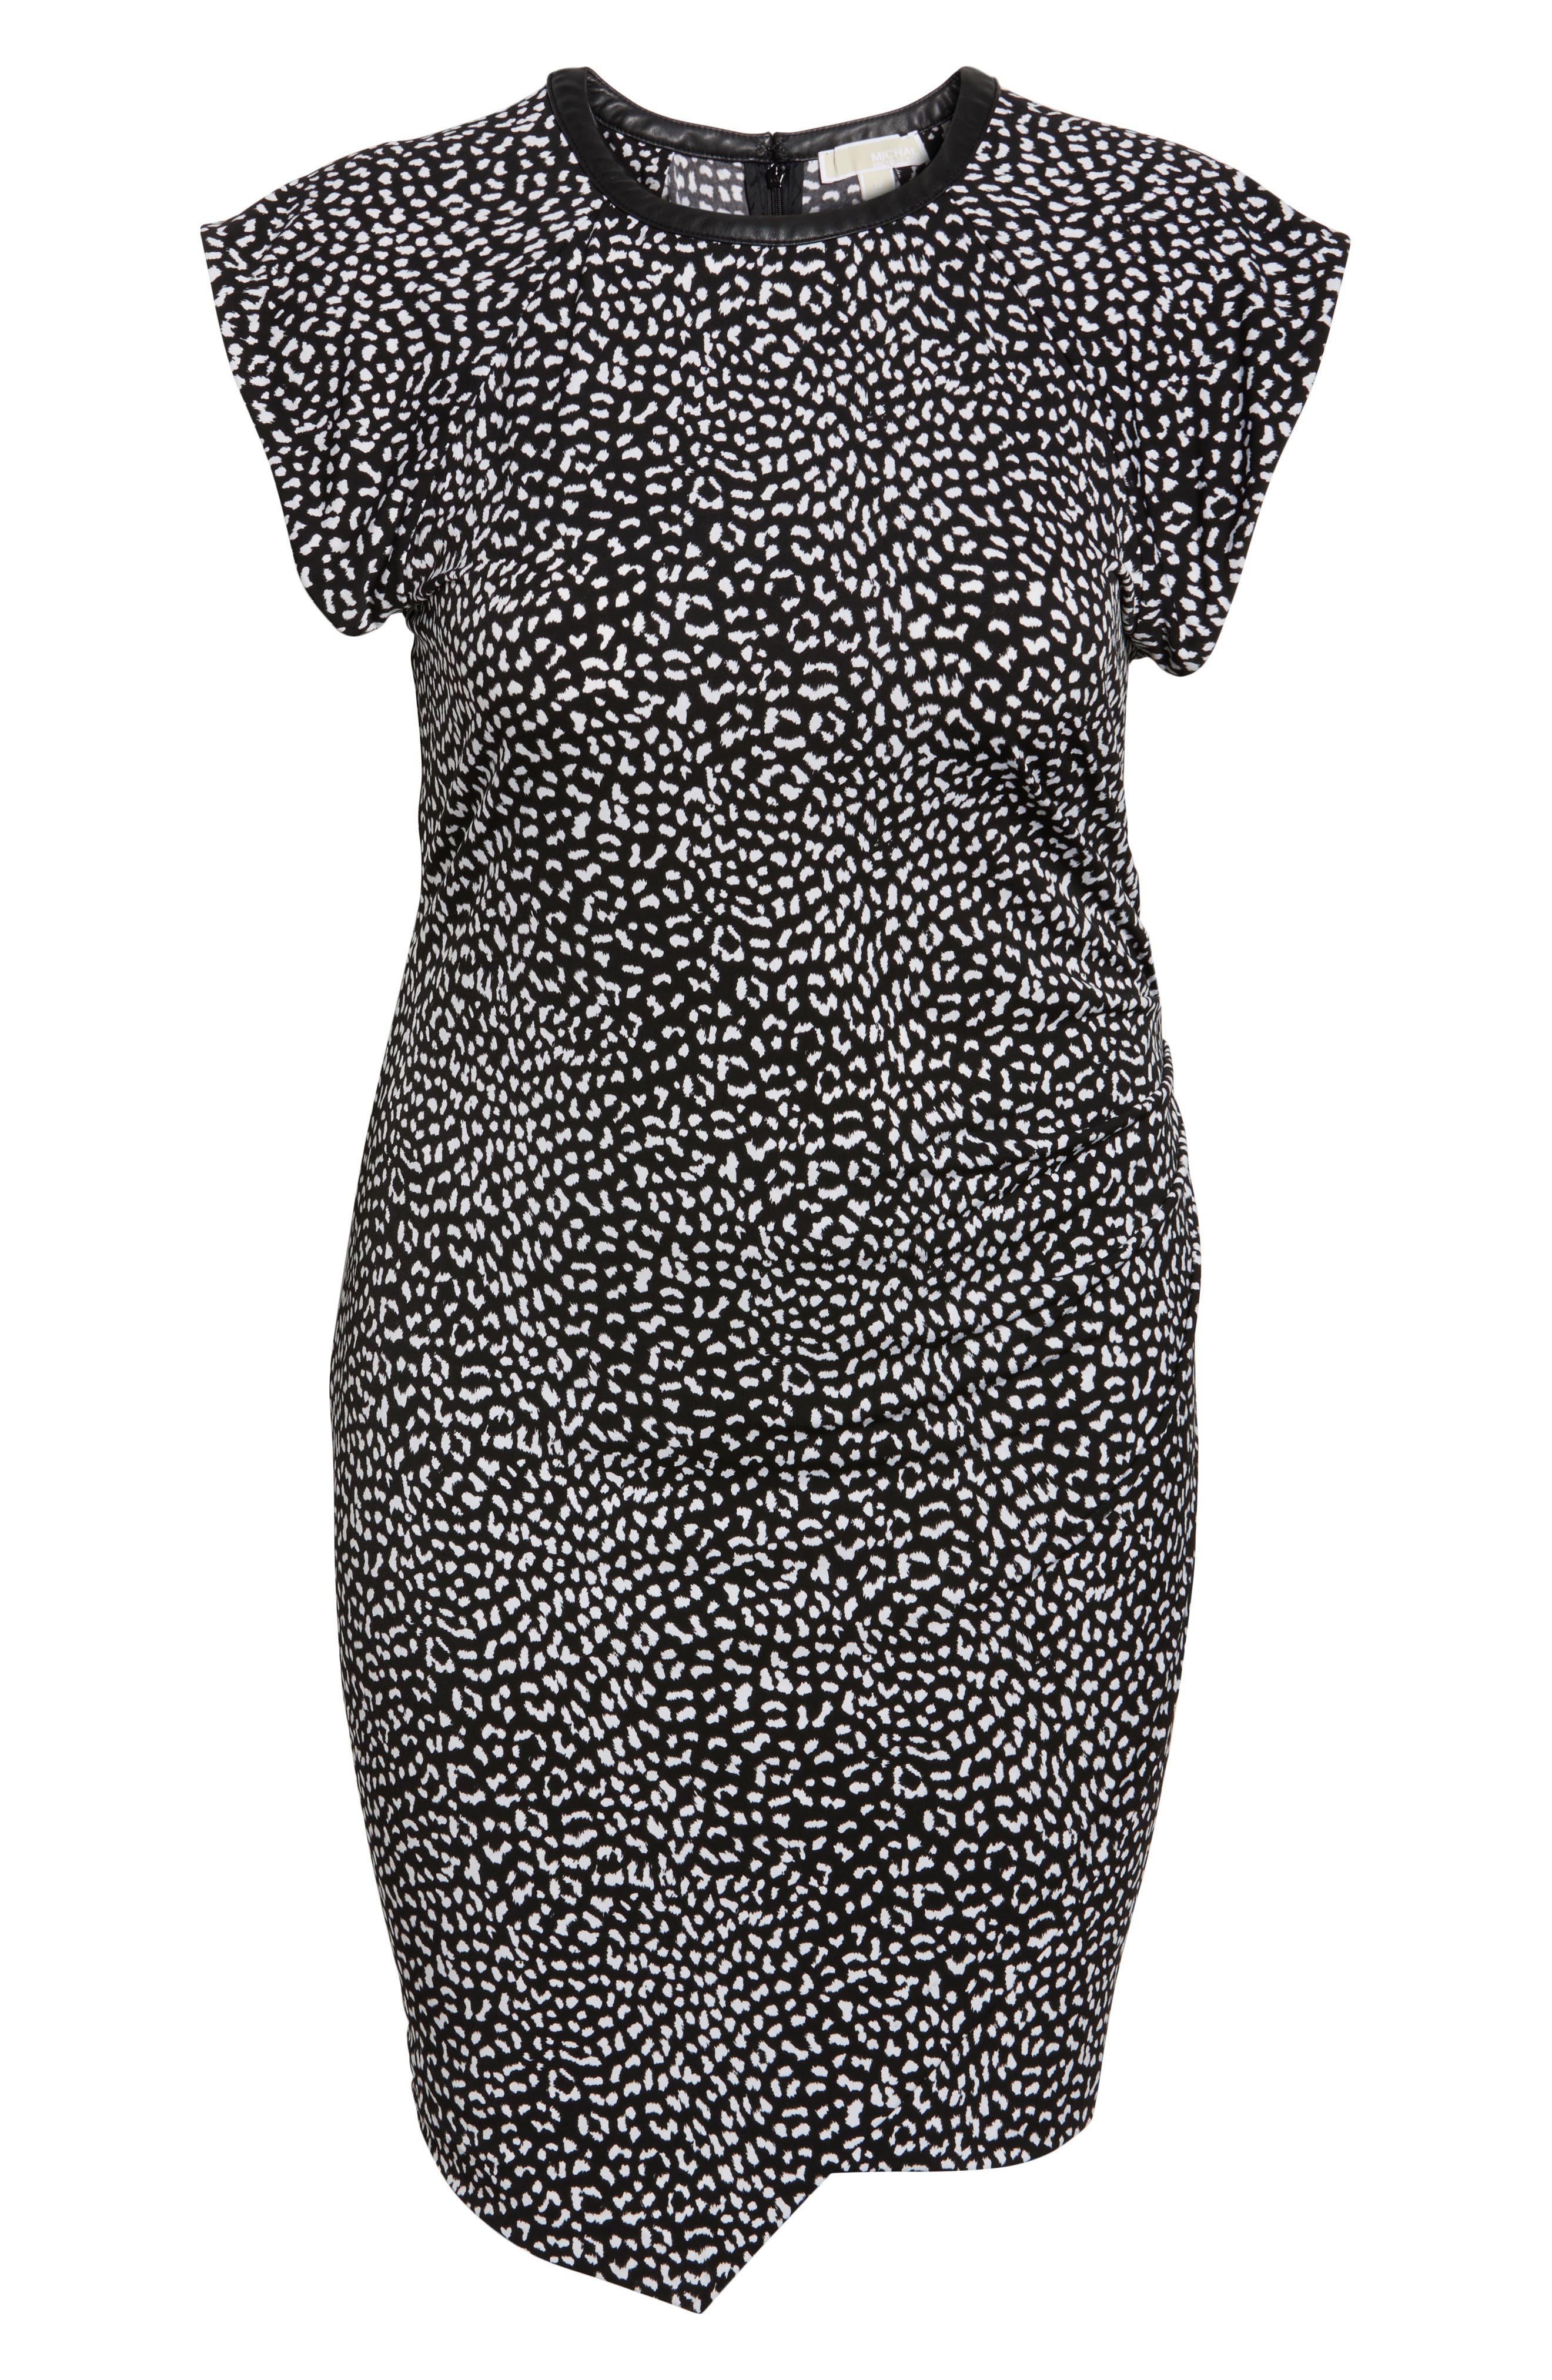 Cheetah Print Flutter Sleeve Dress,                             Alternate thumbnail 6, color,                             Black